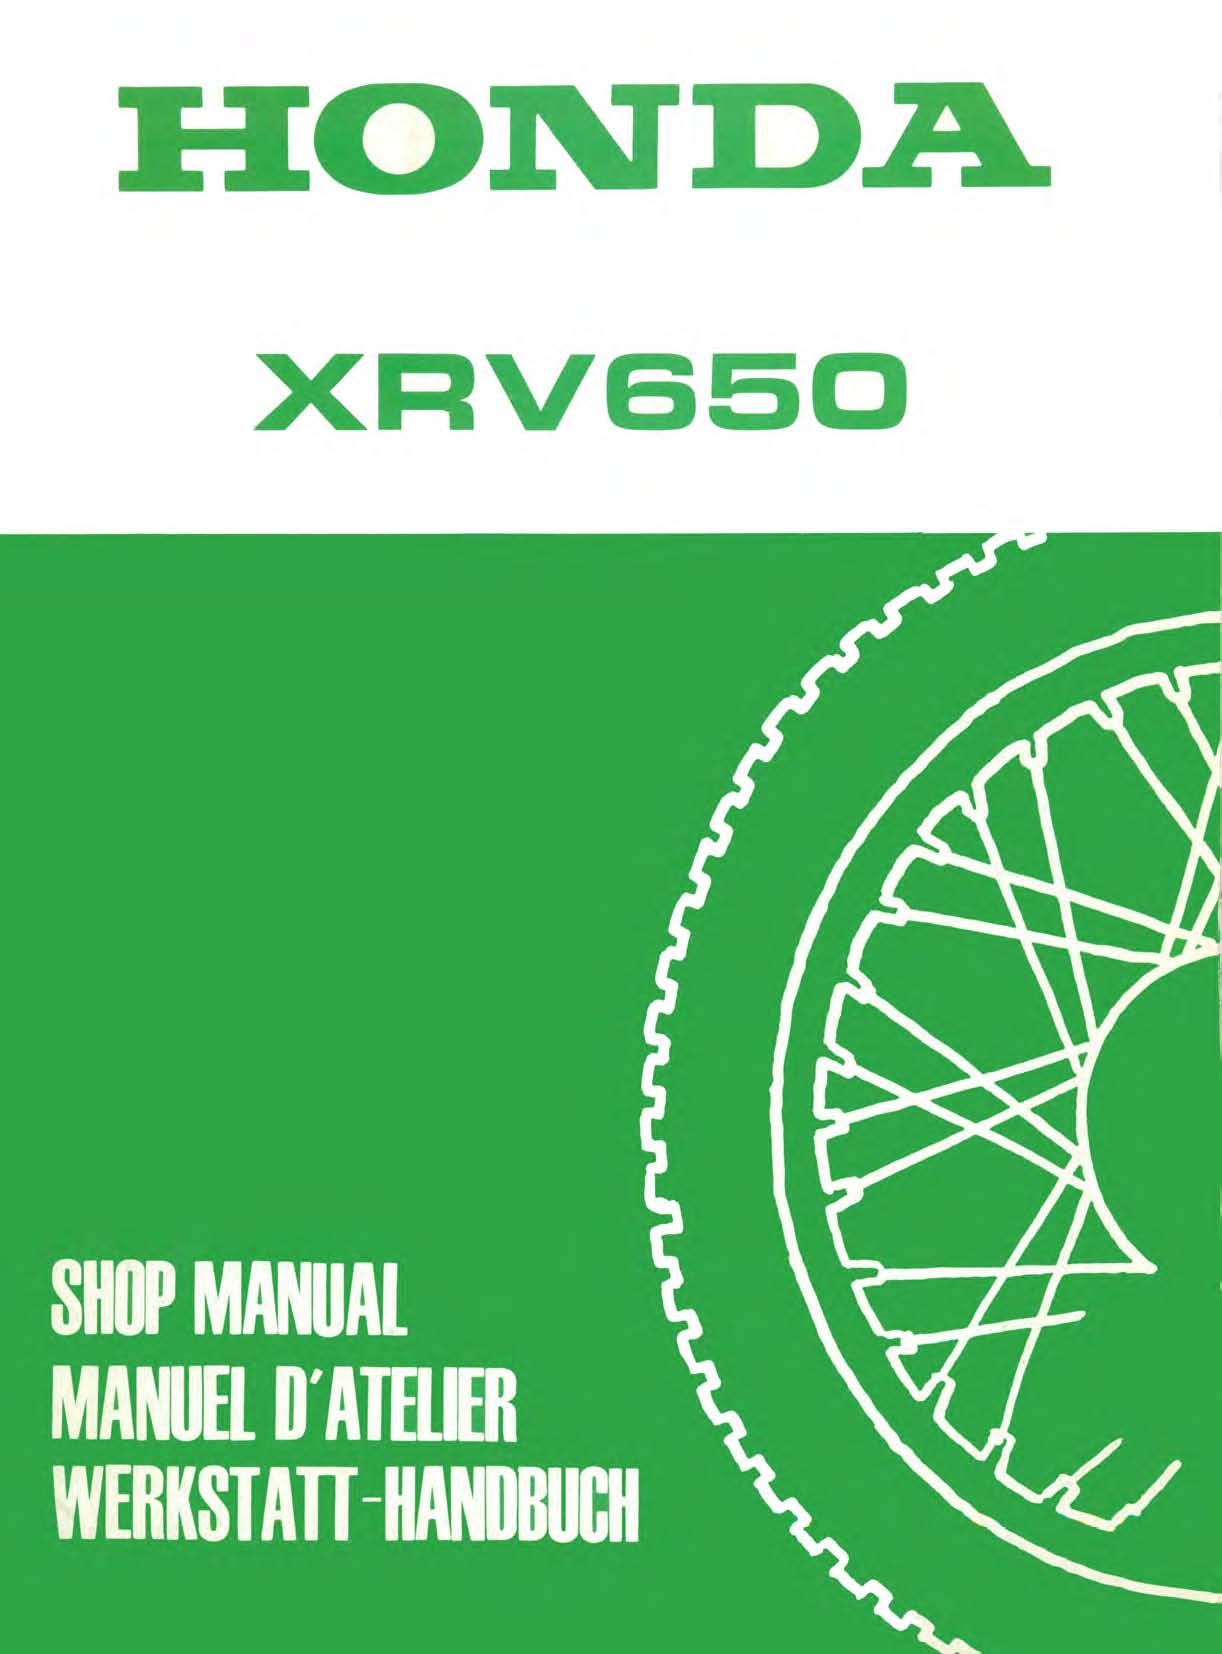 Workshop manual for Honda XRV650 (1988-1989)